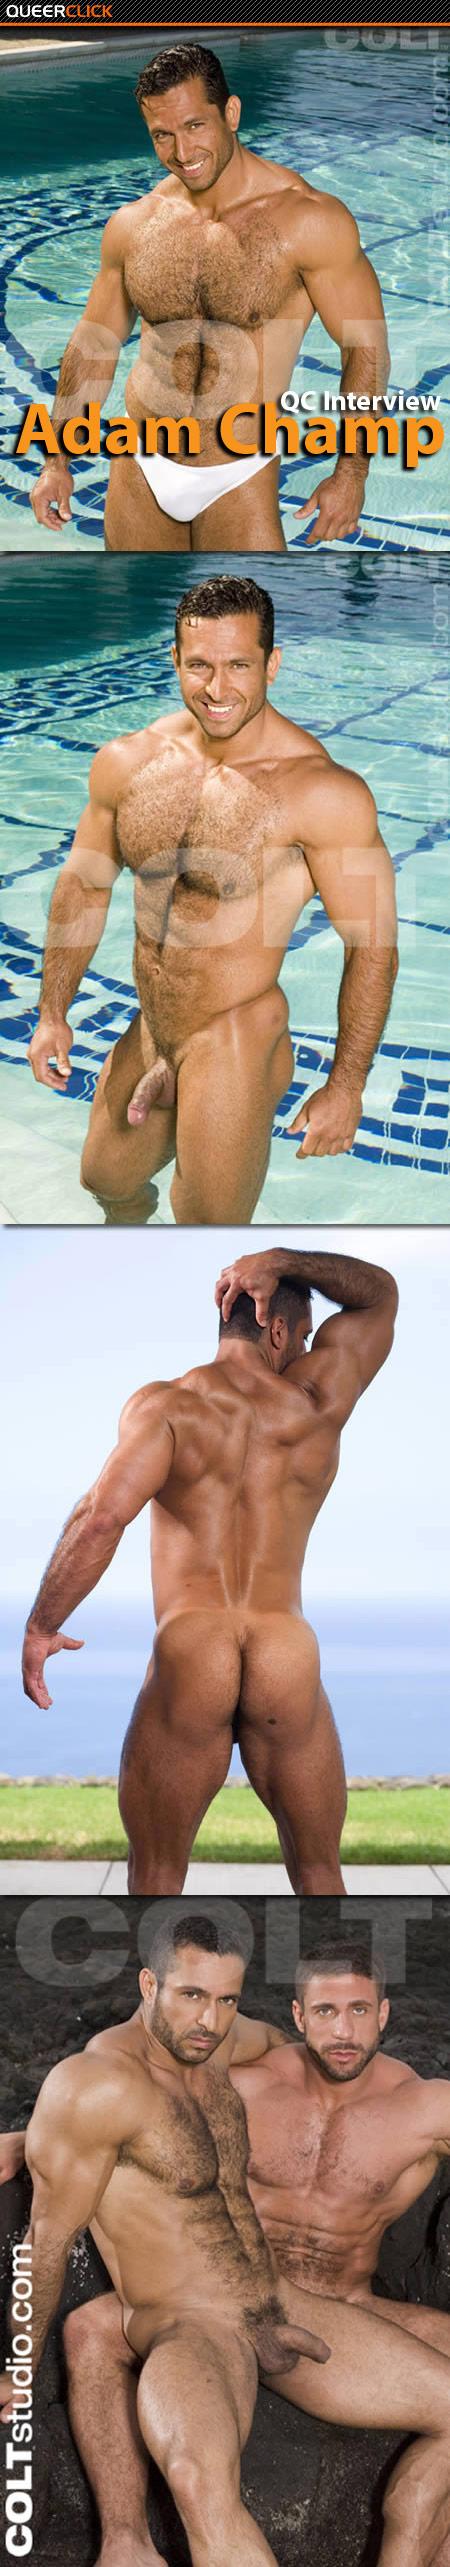 Adam Champ Carlo Masi Gay Porn Free Videos qc interview: adam champ - queerclick